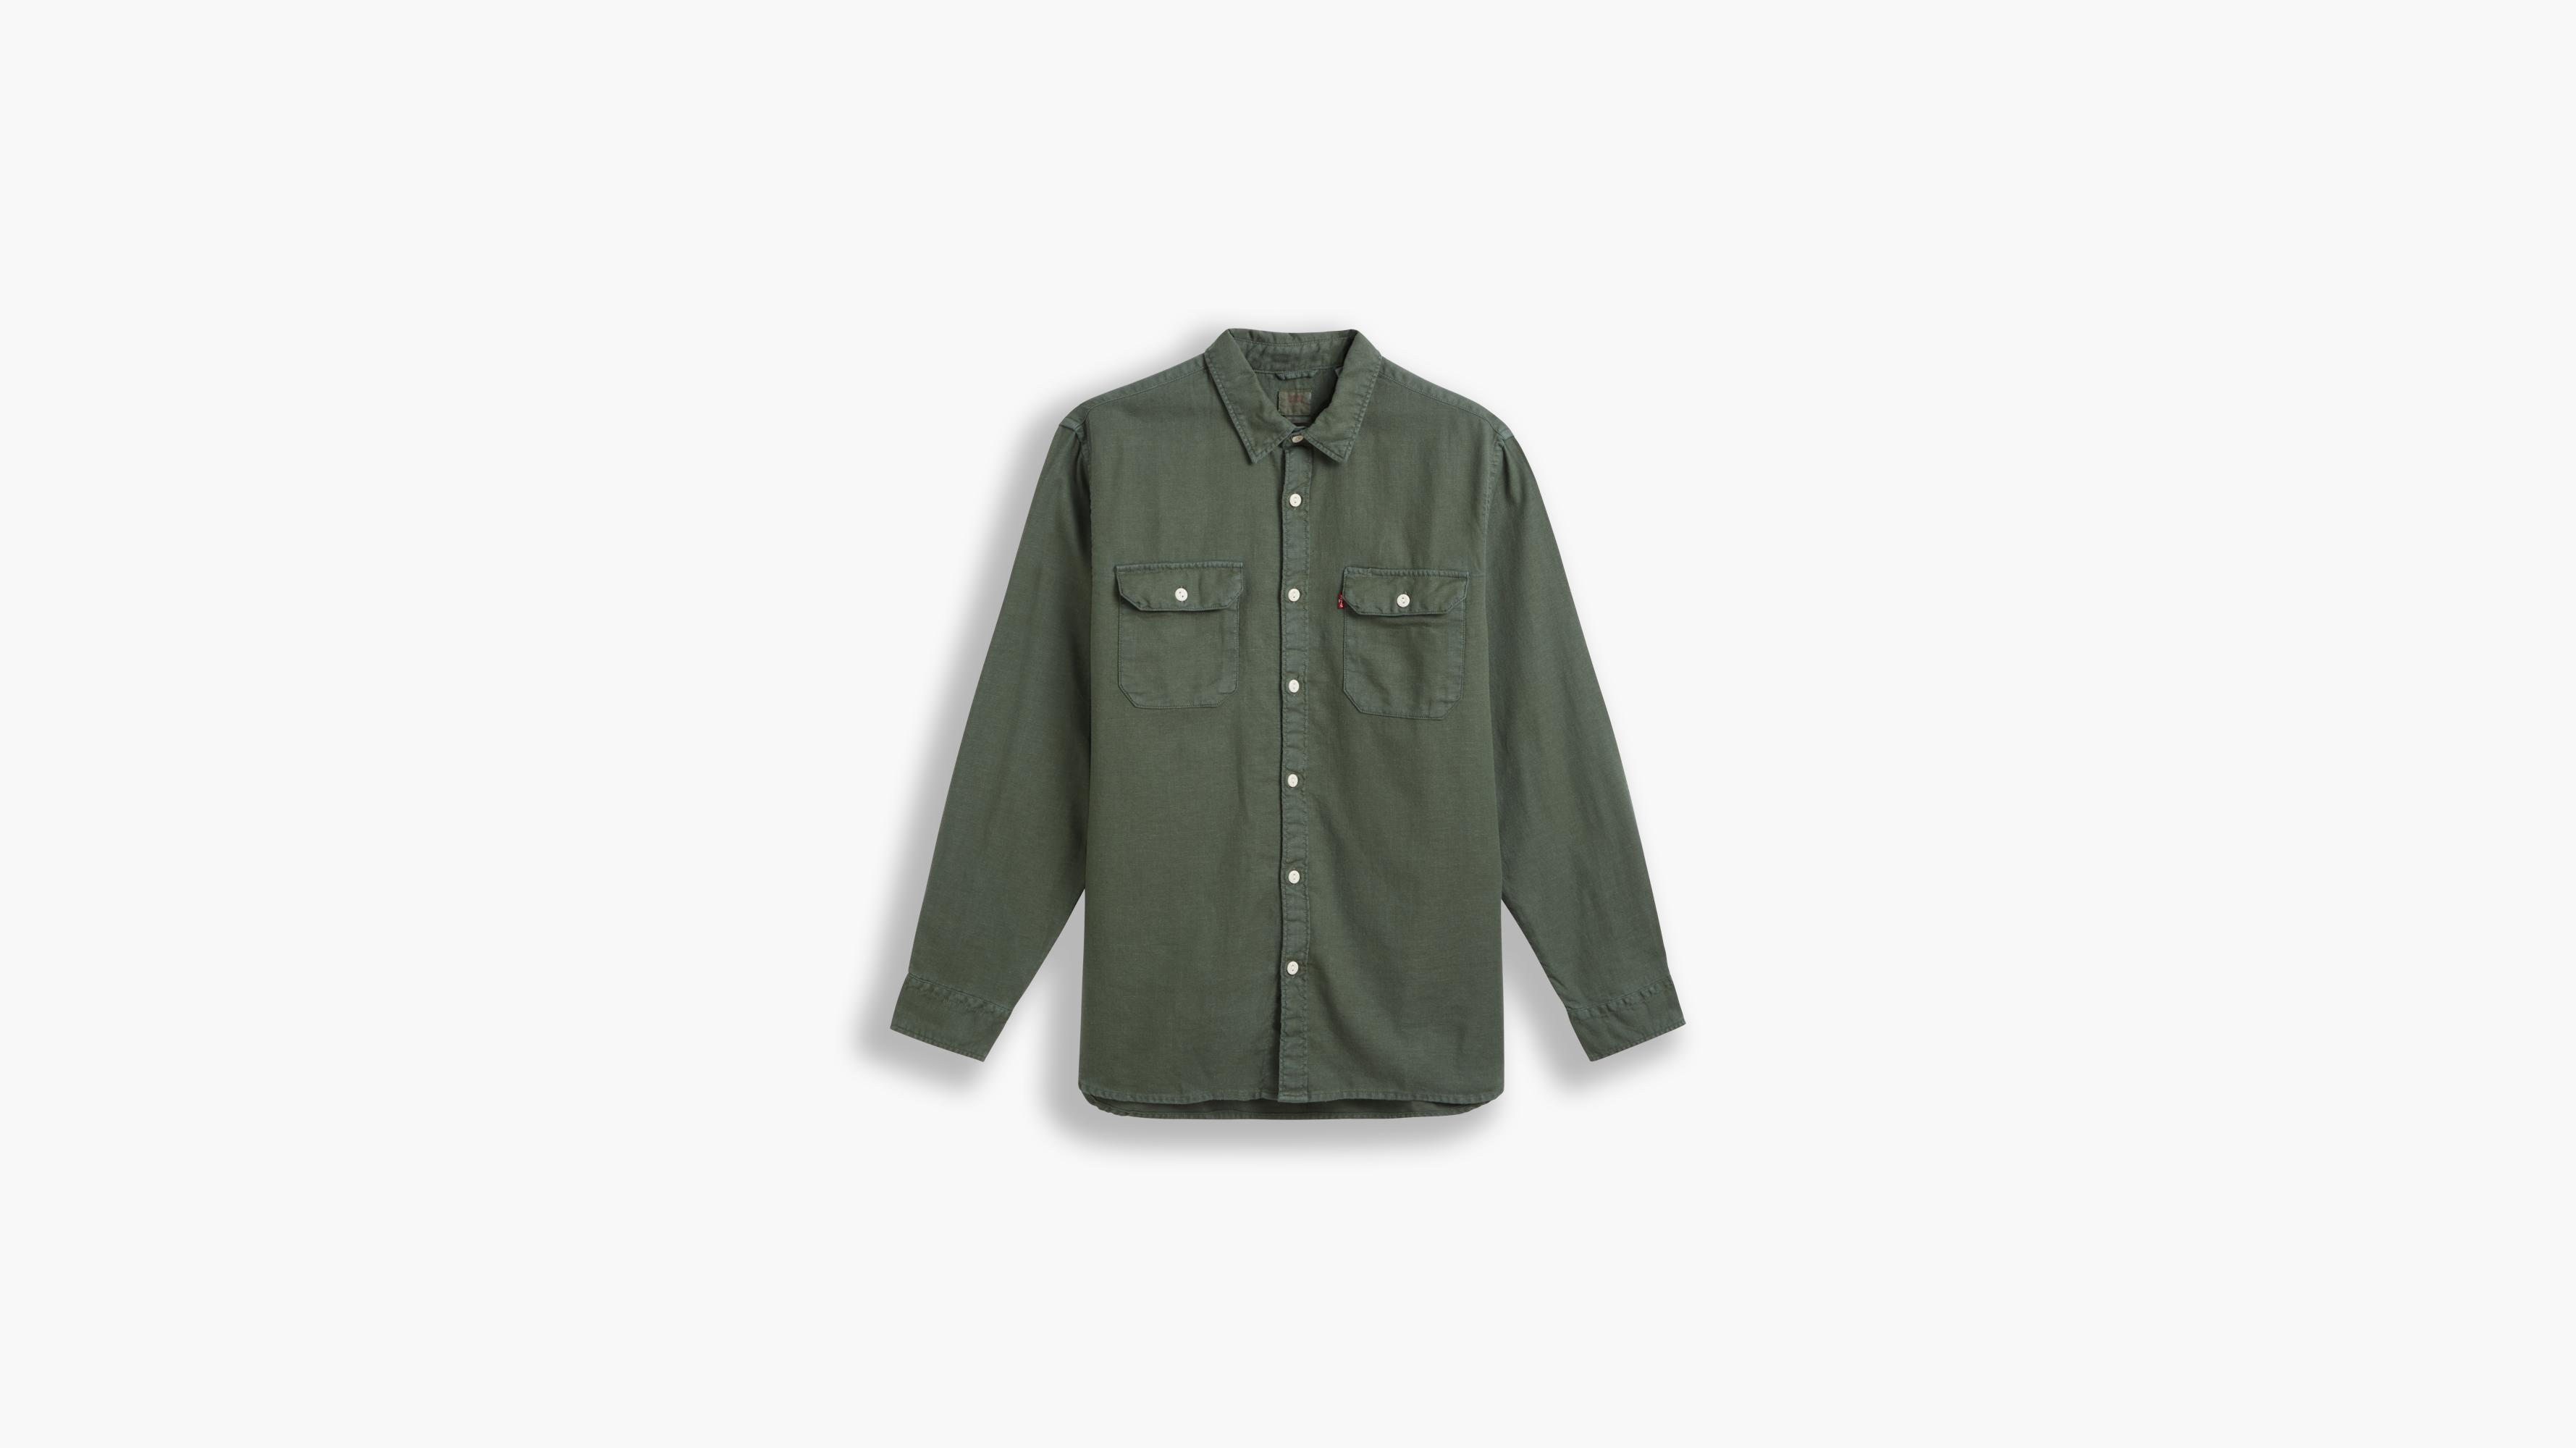 Levi's Jackson Worker skjorte